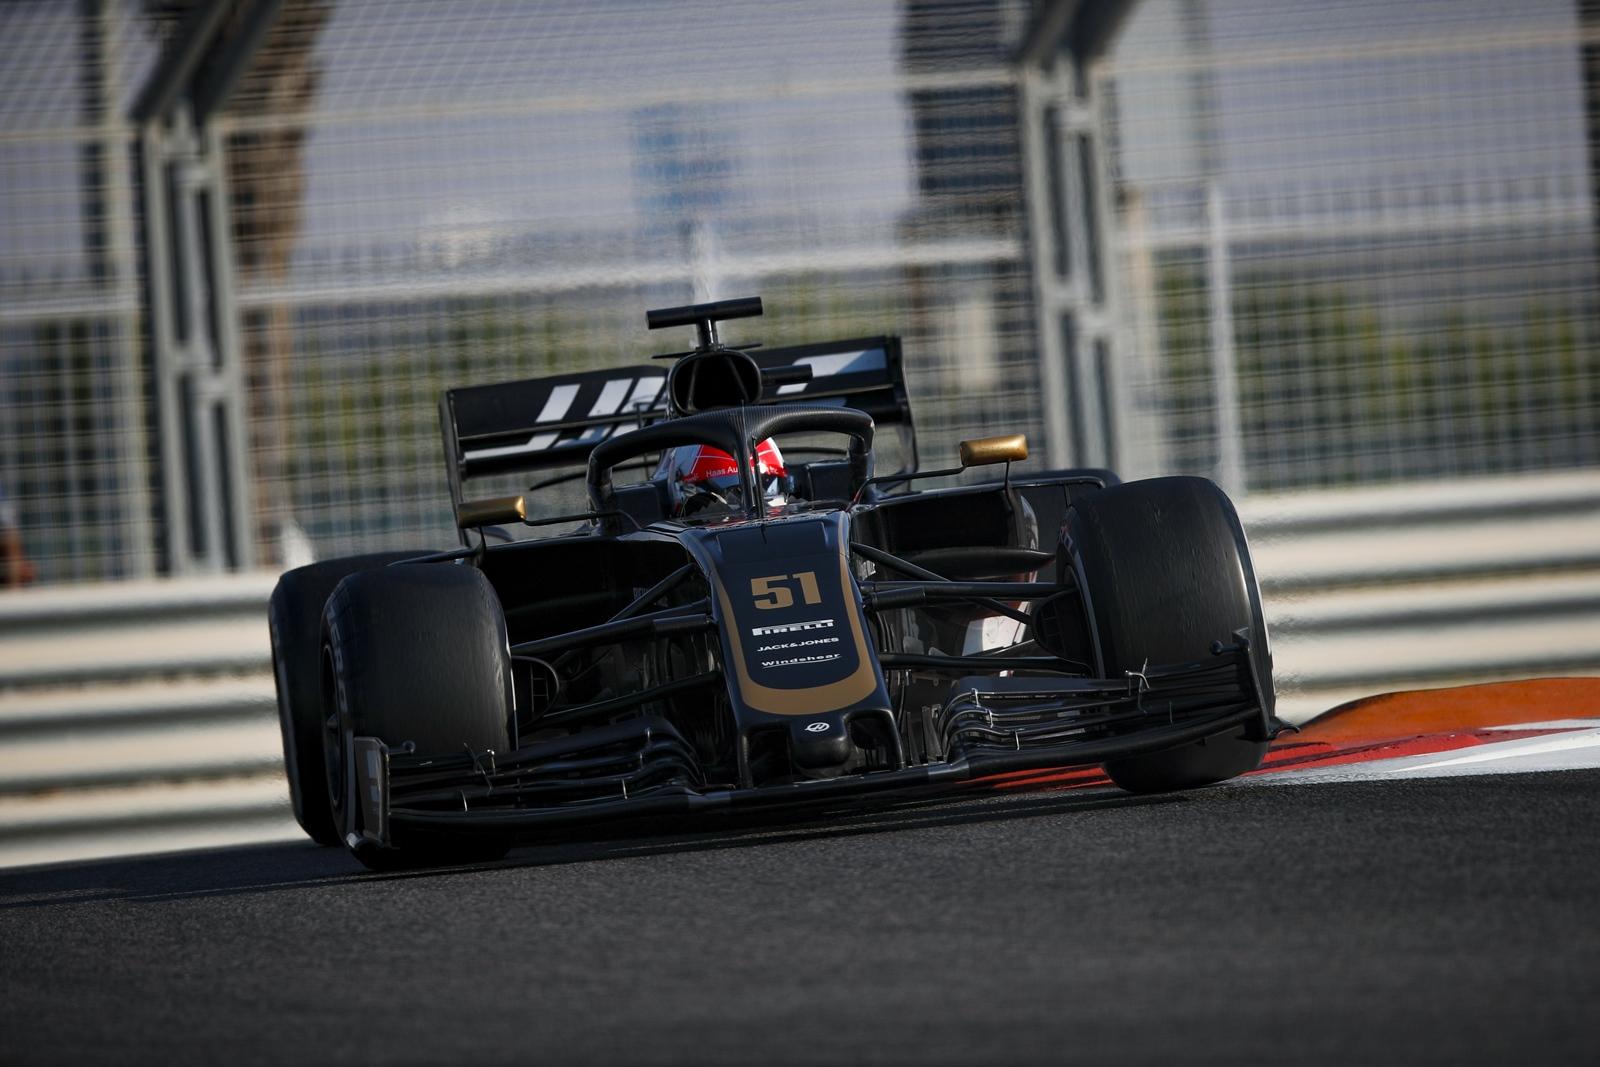 Photo of F1 – Pietro Fittipaldi é confirmado como piloto reserva e de testes da Haas na F1